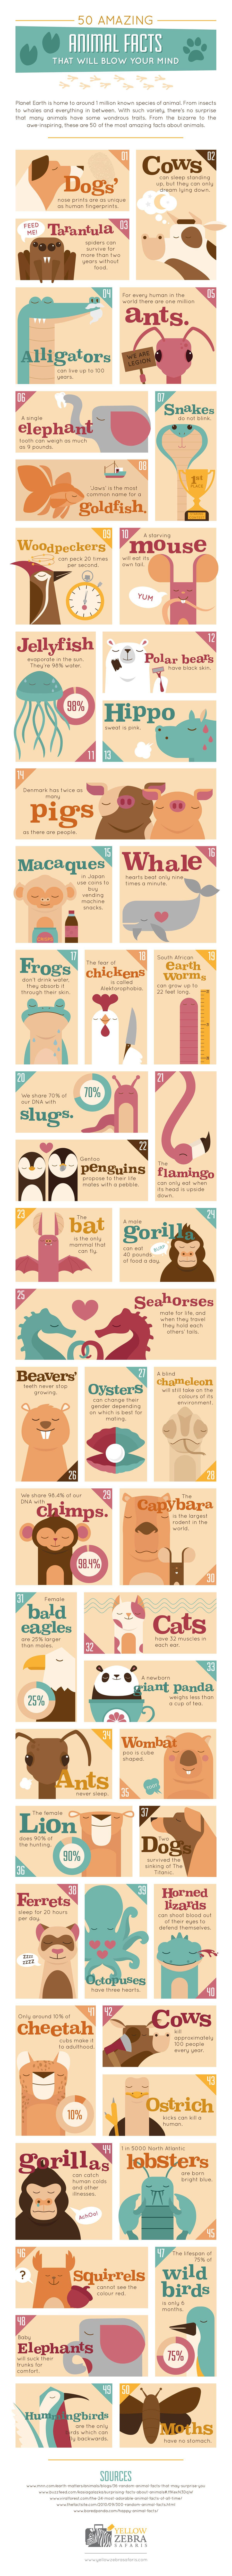 50 datos infografía animales_2